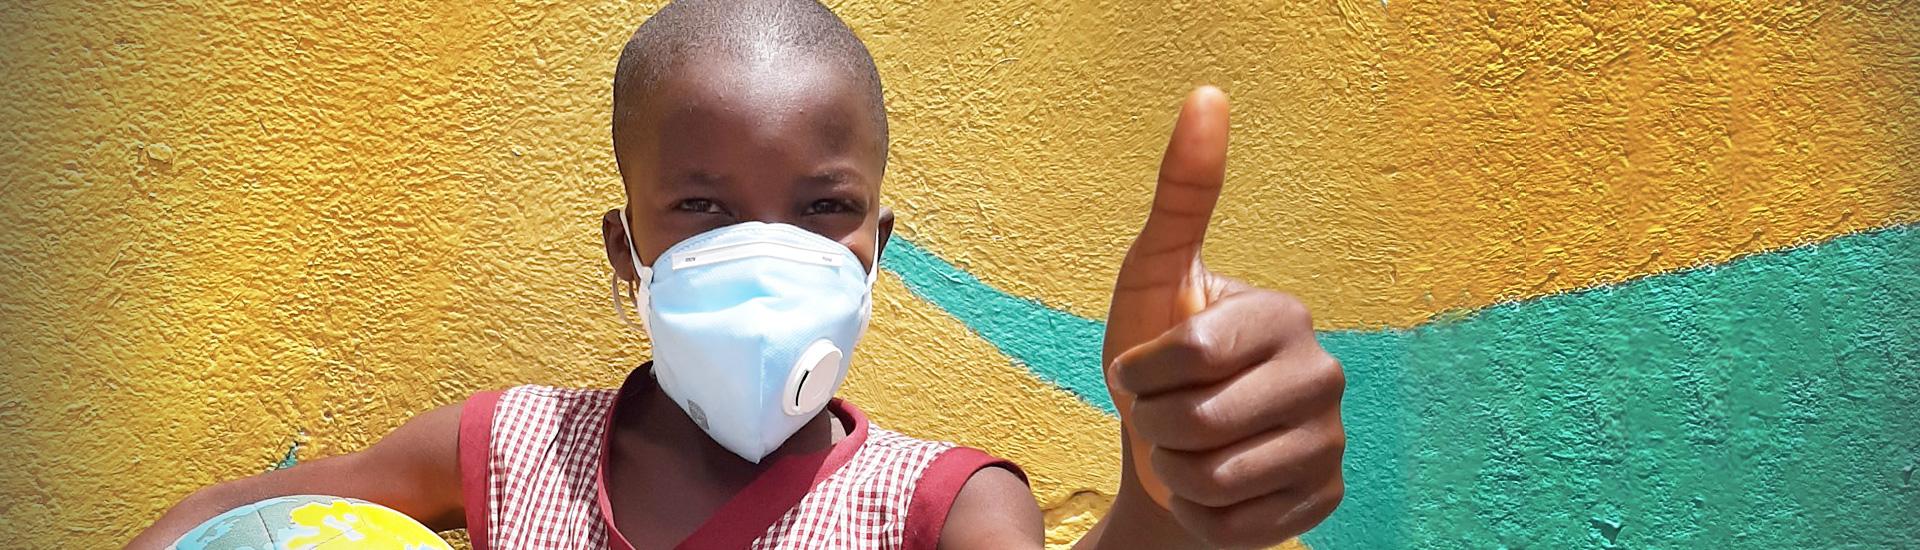 Emergencia coronavirus en el mundo